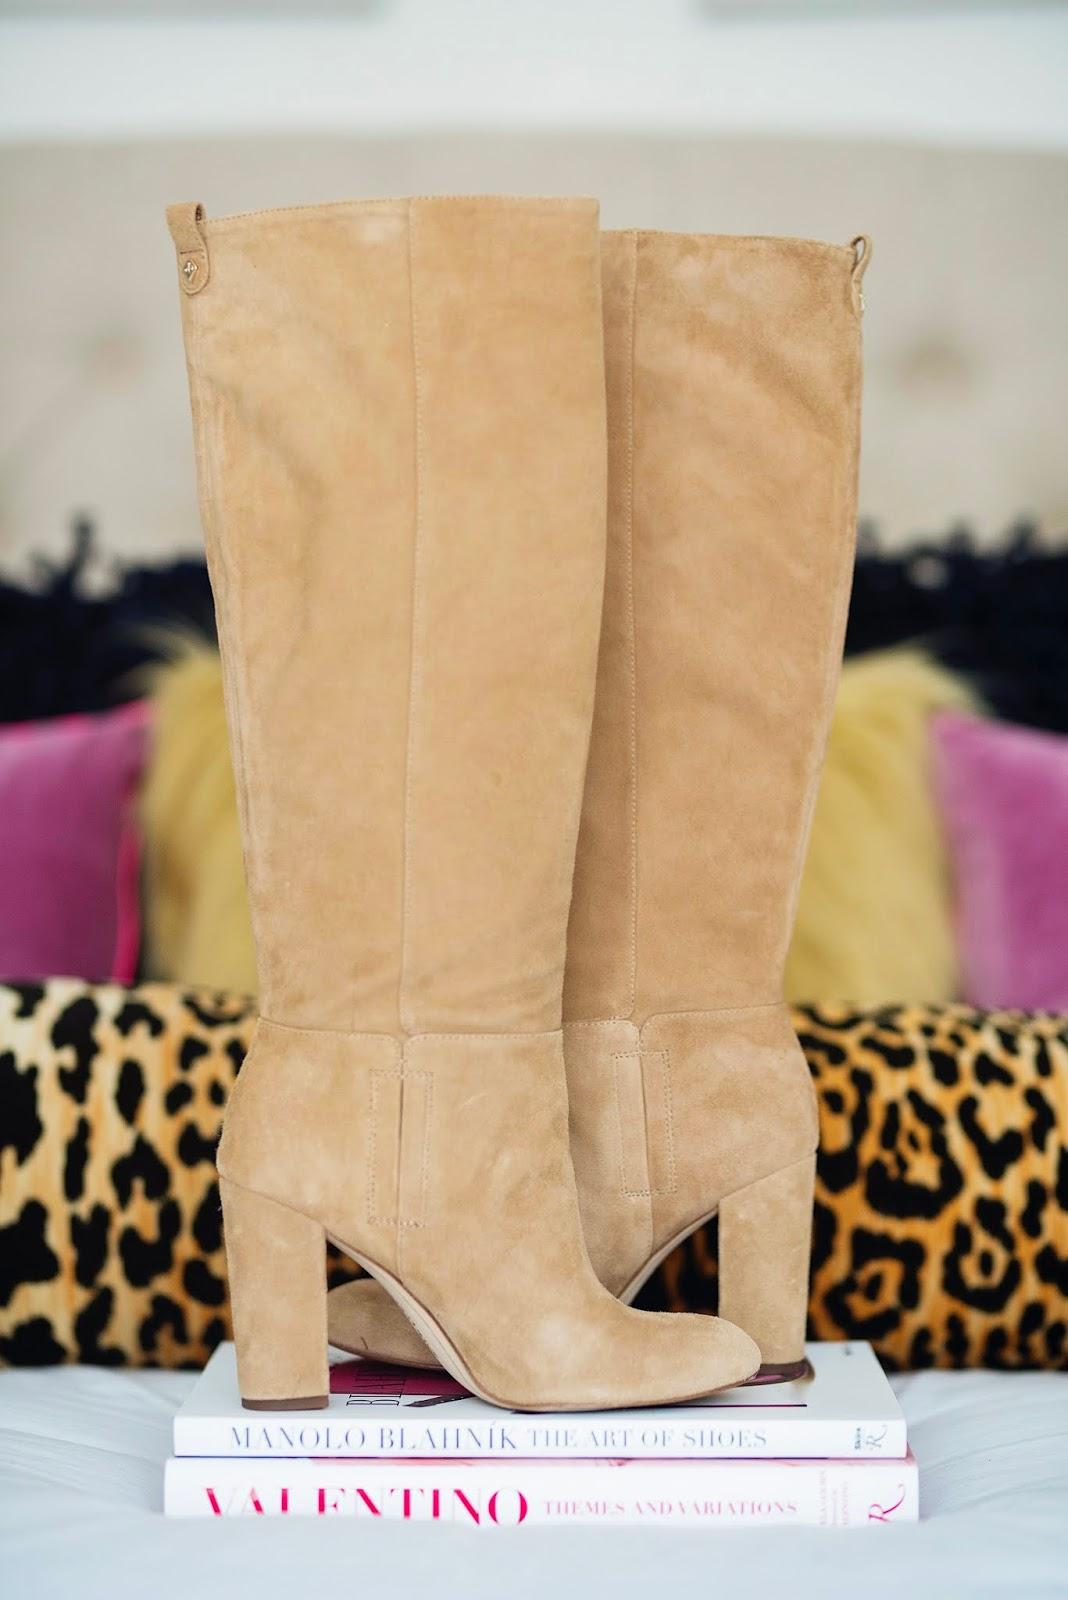 48782c23df2 Nordstrom Anniversary Sale Sam Edelman Caprice Knee-High Boots - Something  Delightful Blog